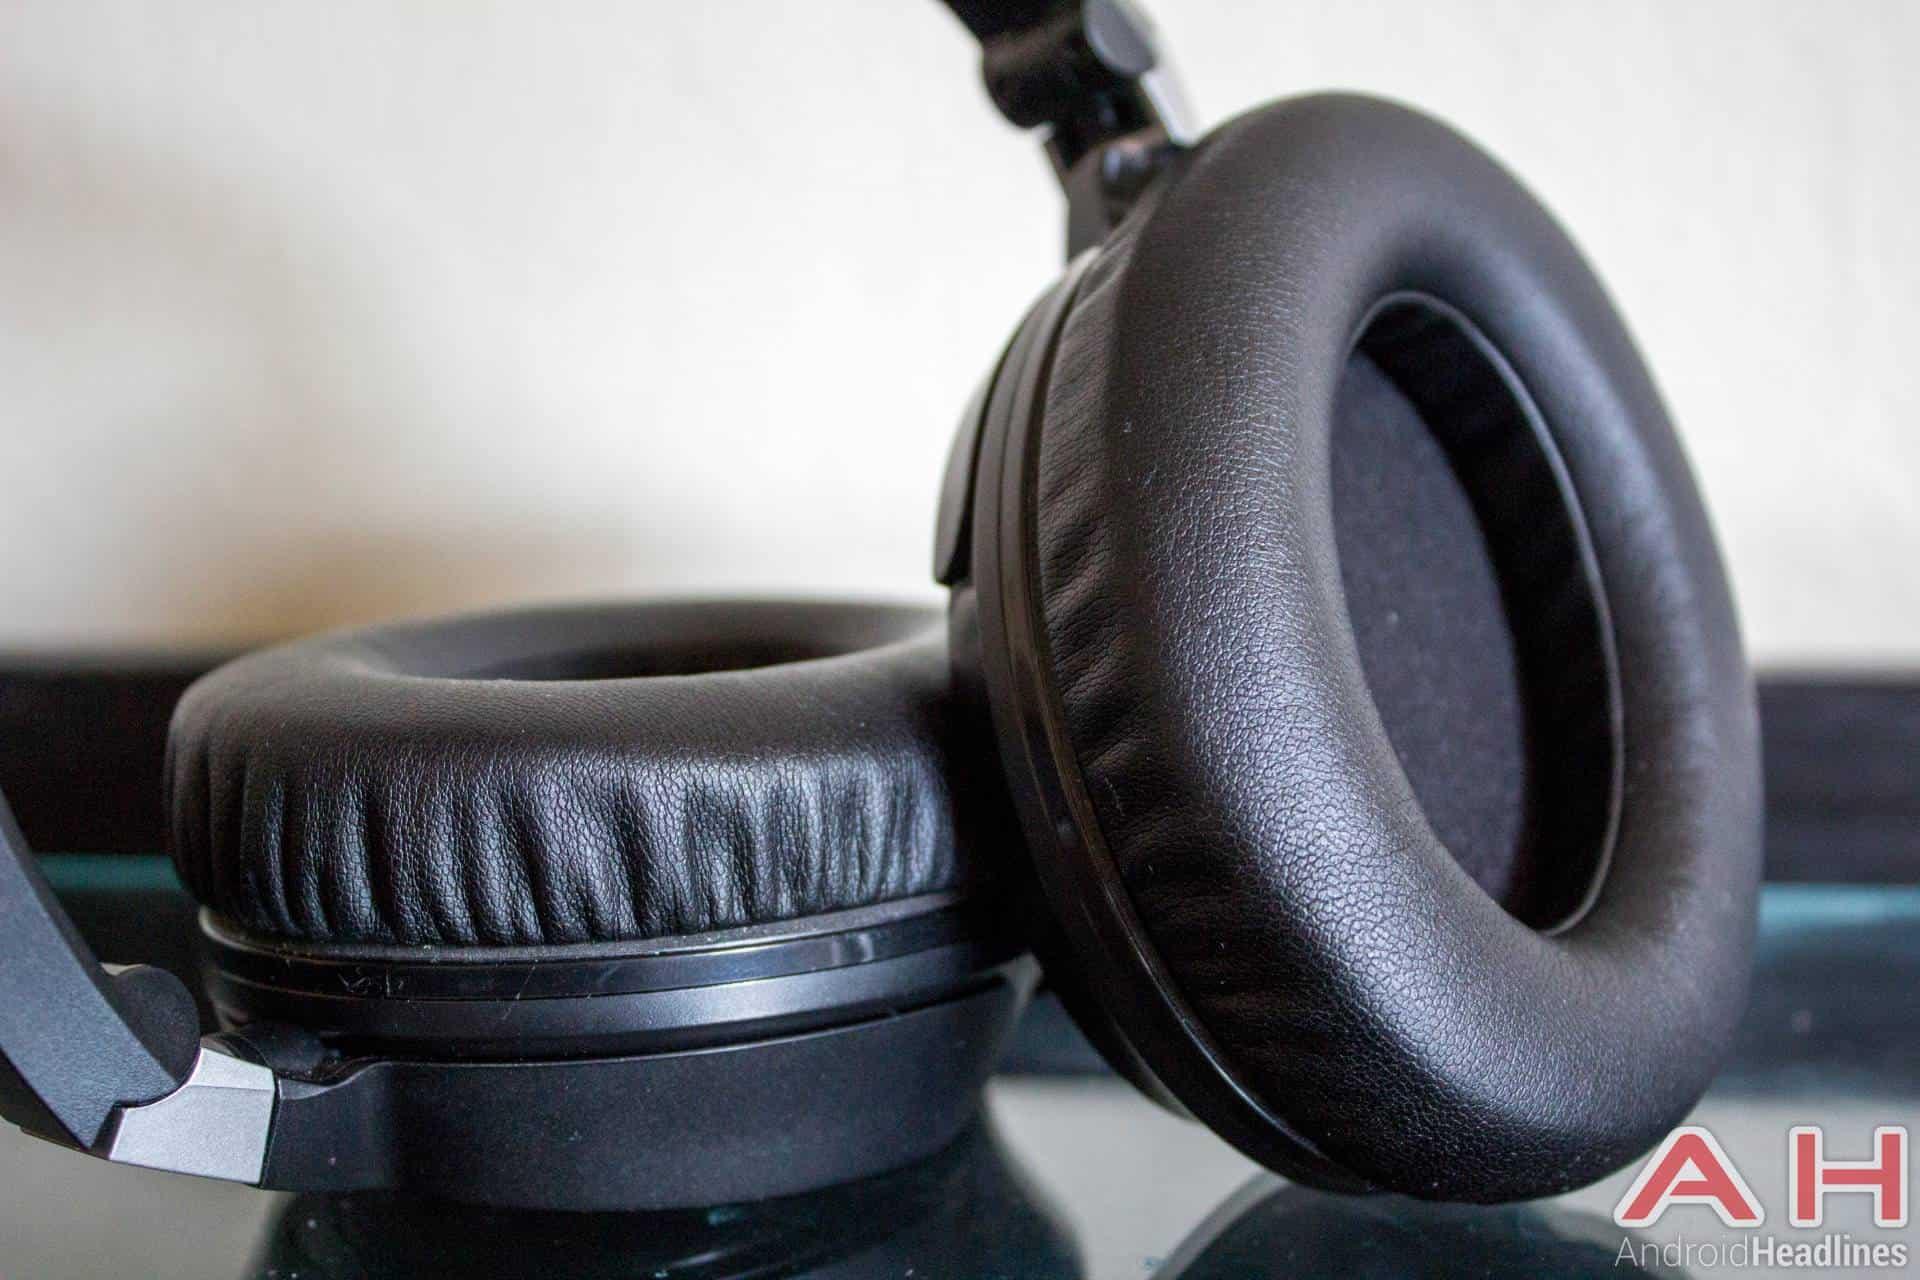 Audiotechnica-ANC70-AH-NS-05